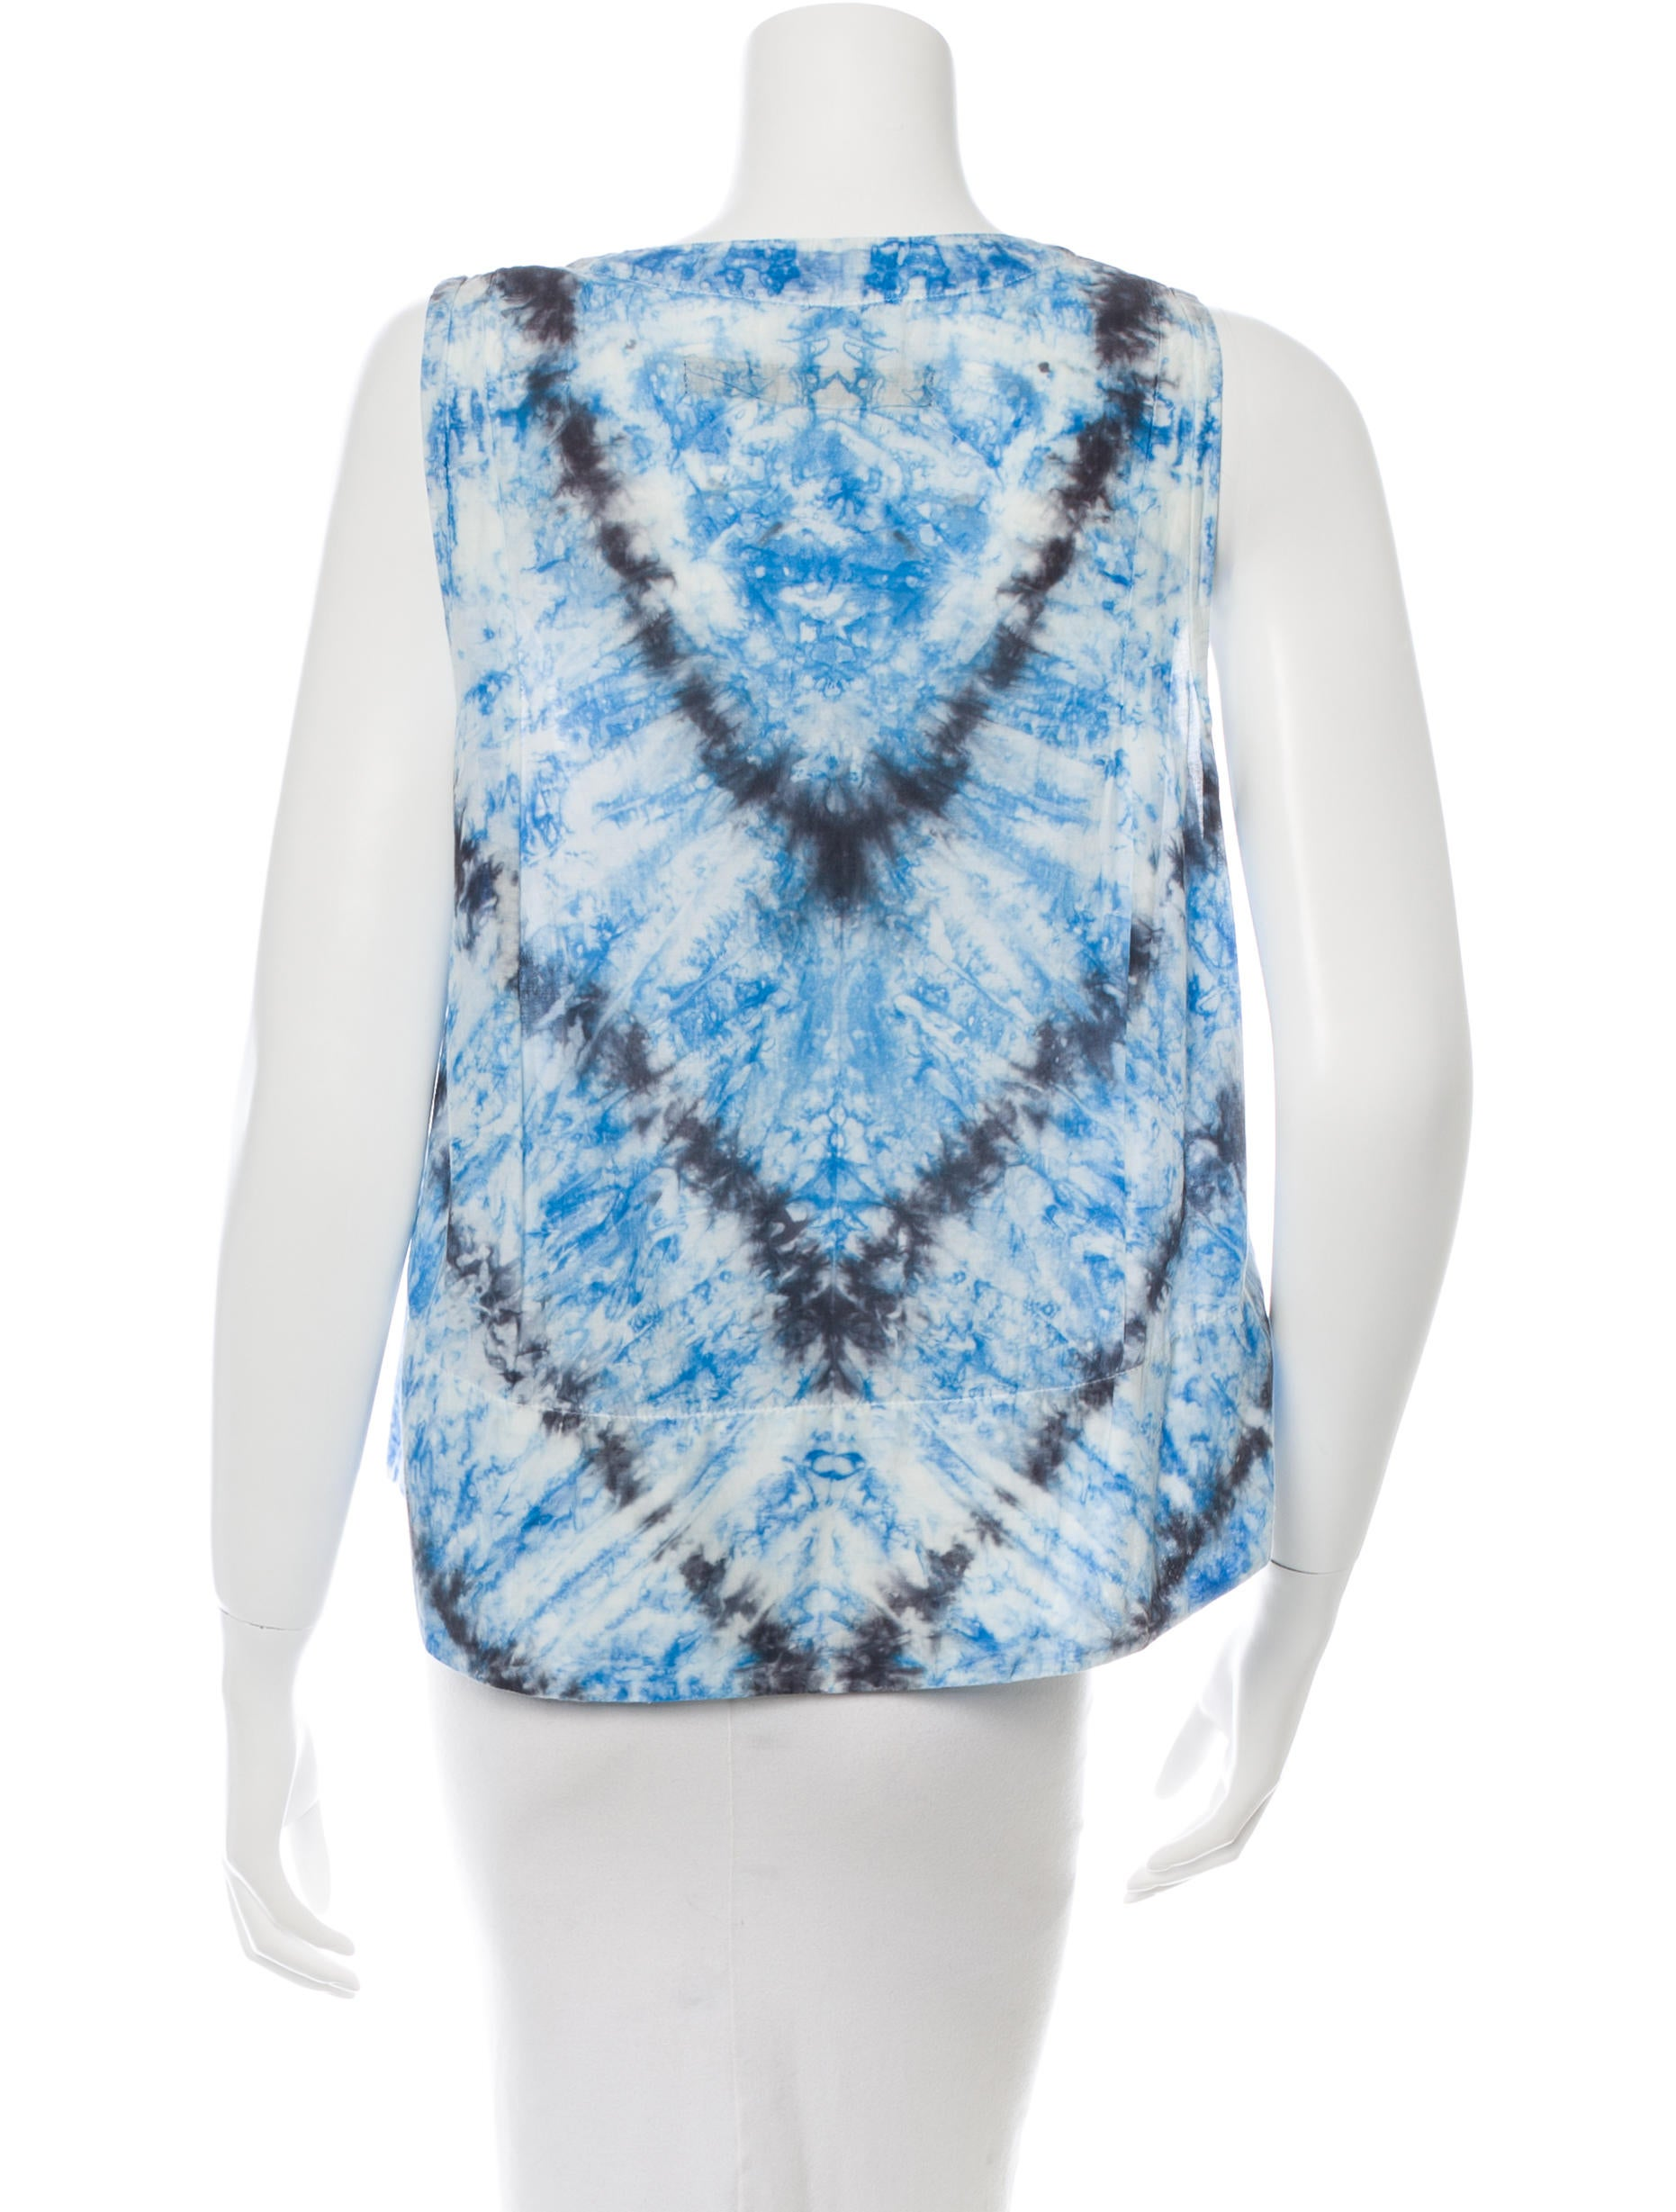 Raquel allegra sleeveless tie dye top clothing for Tie dye sleeveless shirts